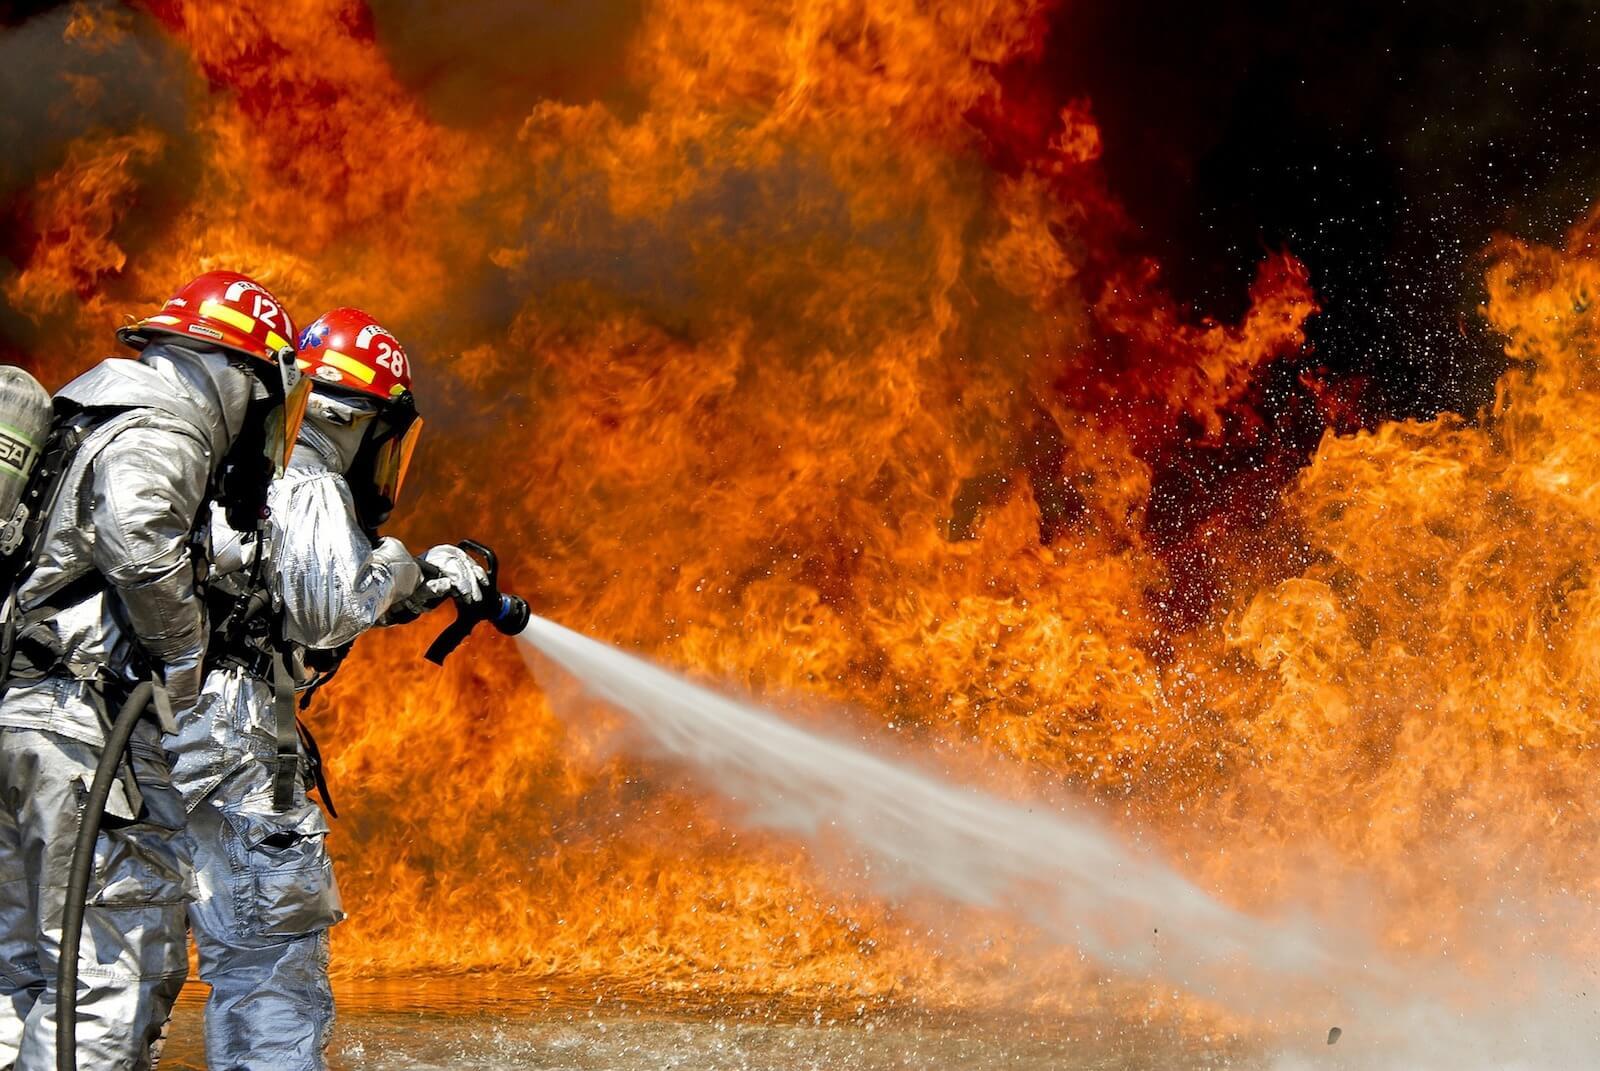 Verhalten bei Terroranschlägen (III): Brandanschlag